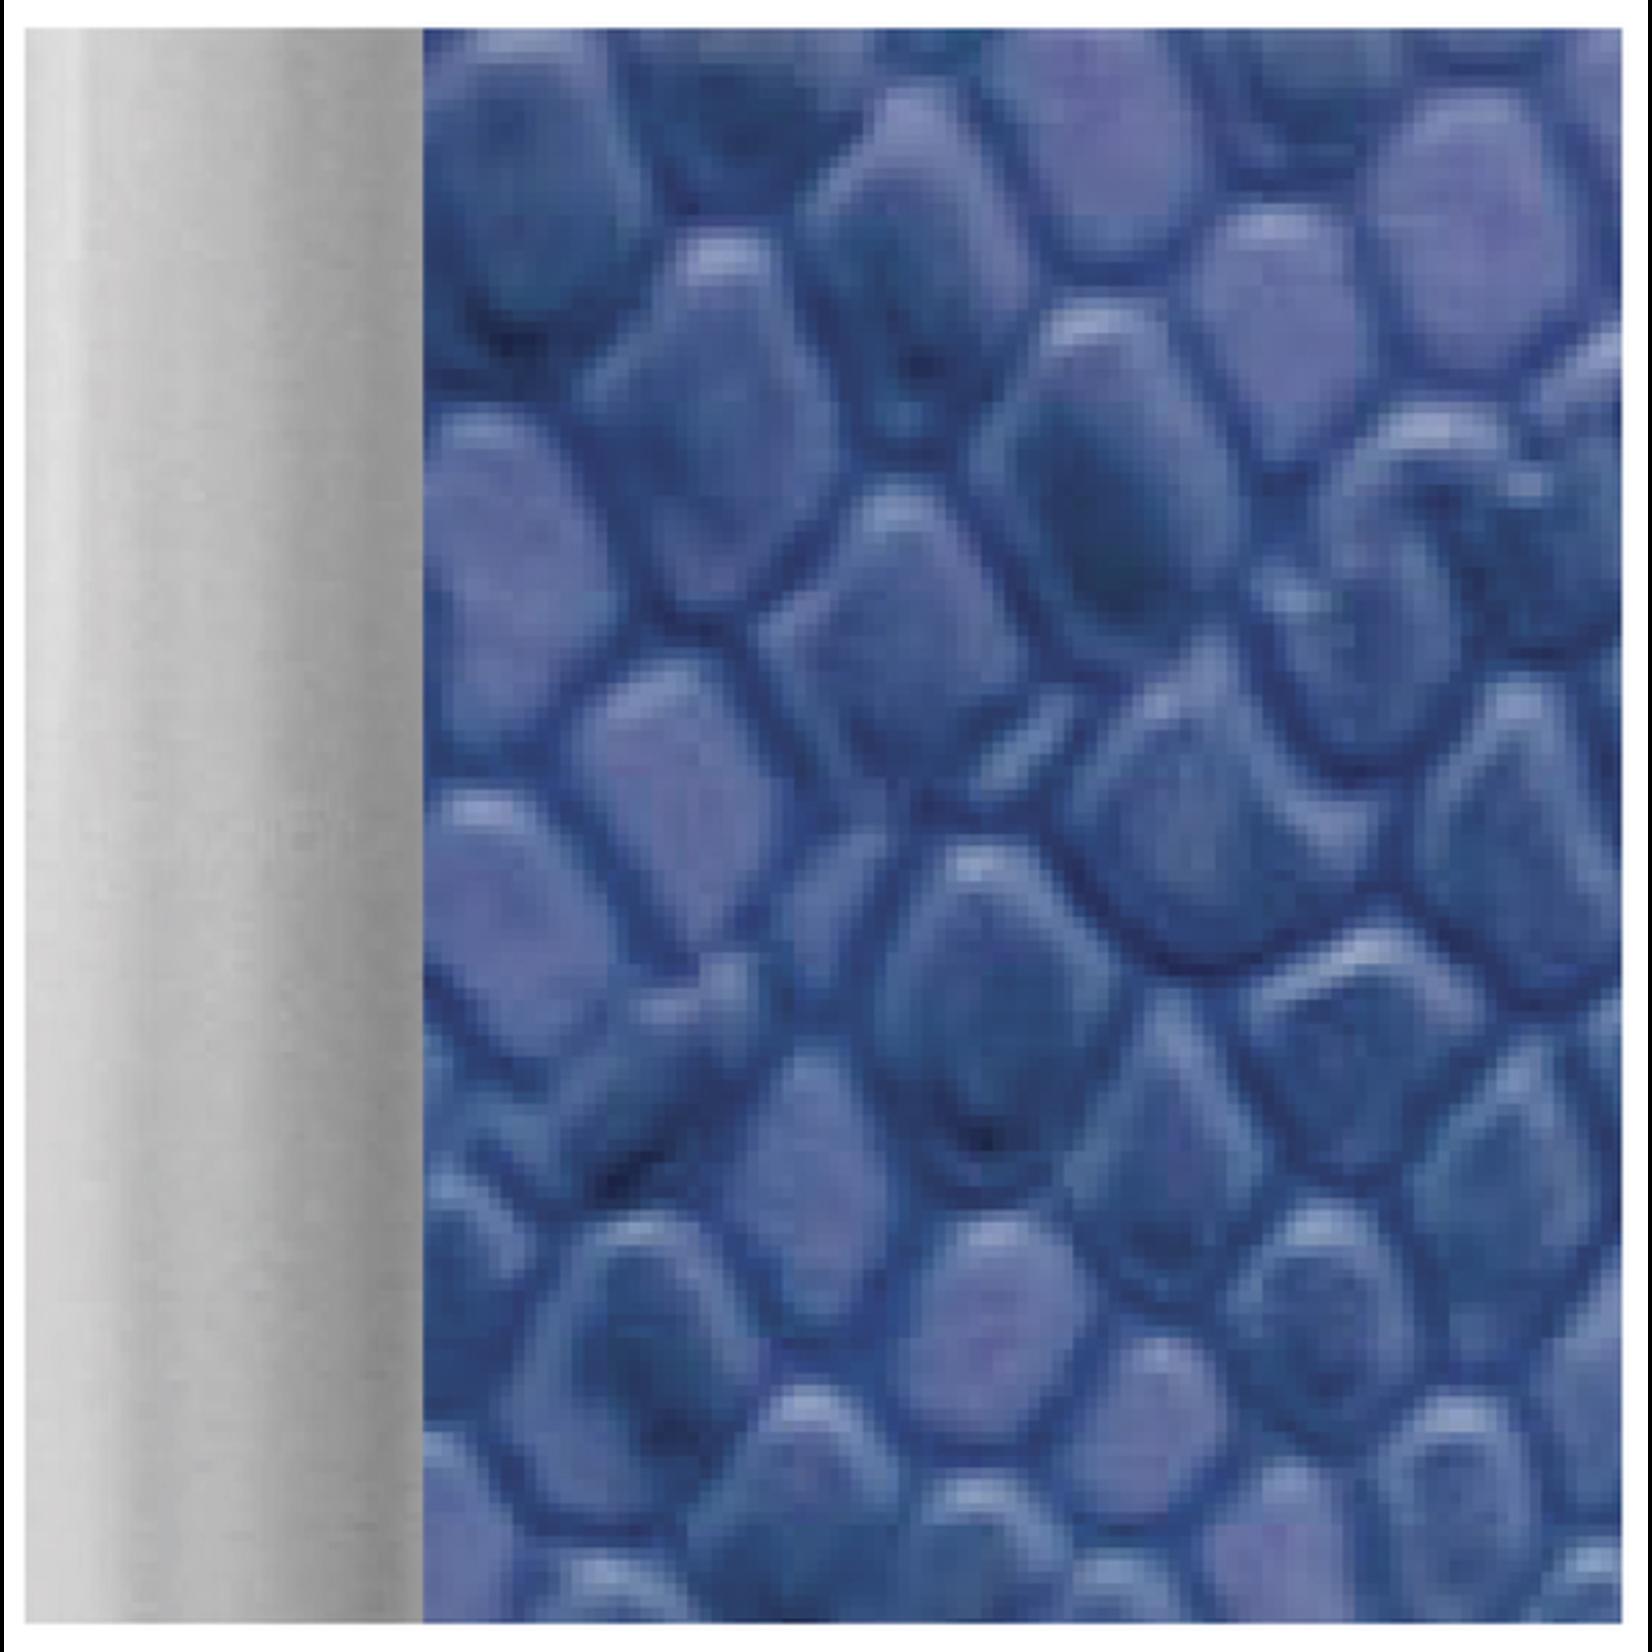 HBN5023 Snakeskin Crossbody Wallet Cool - Cobalt